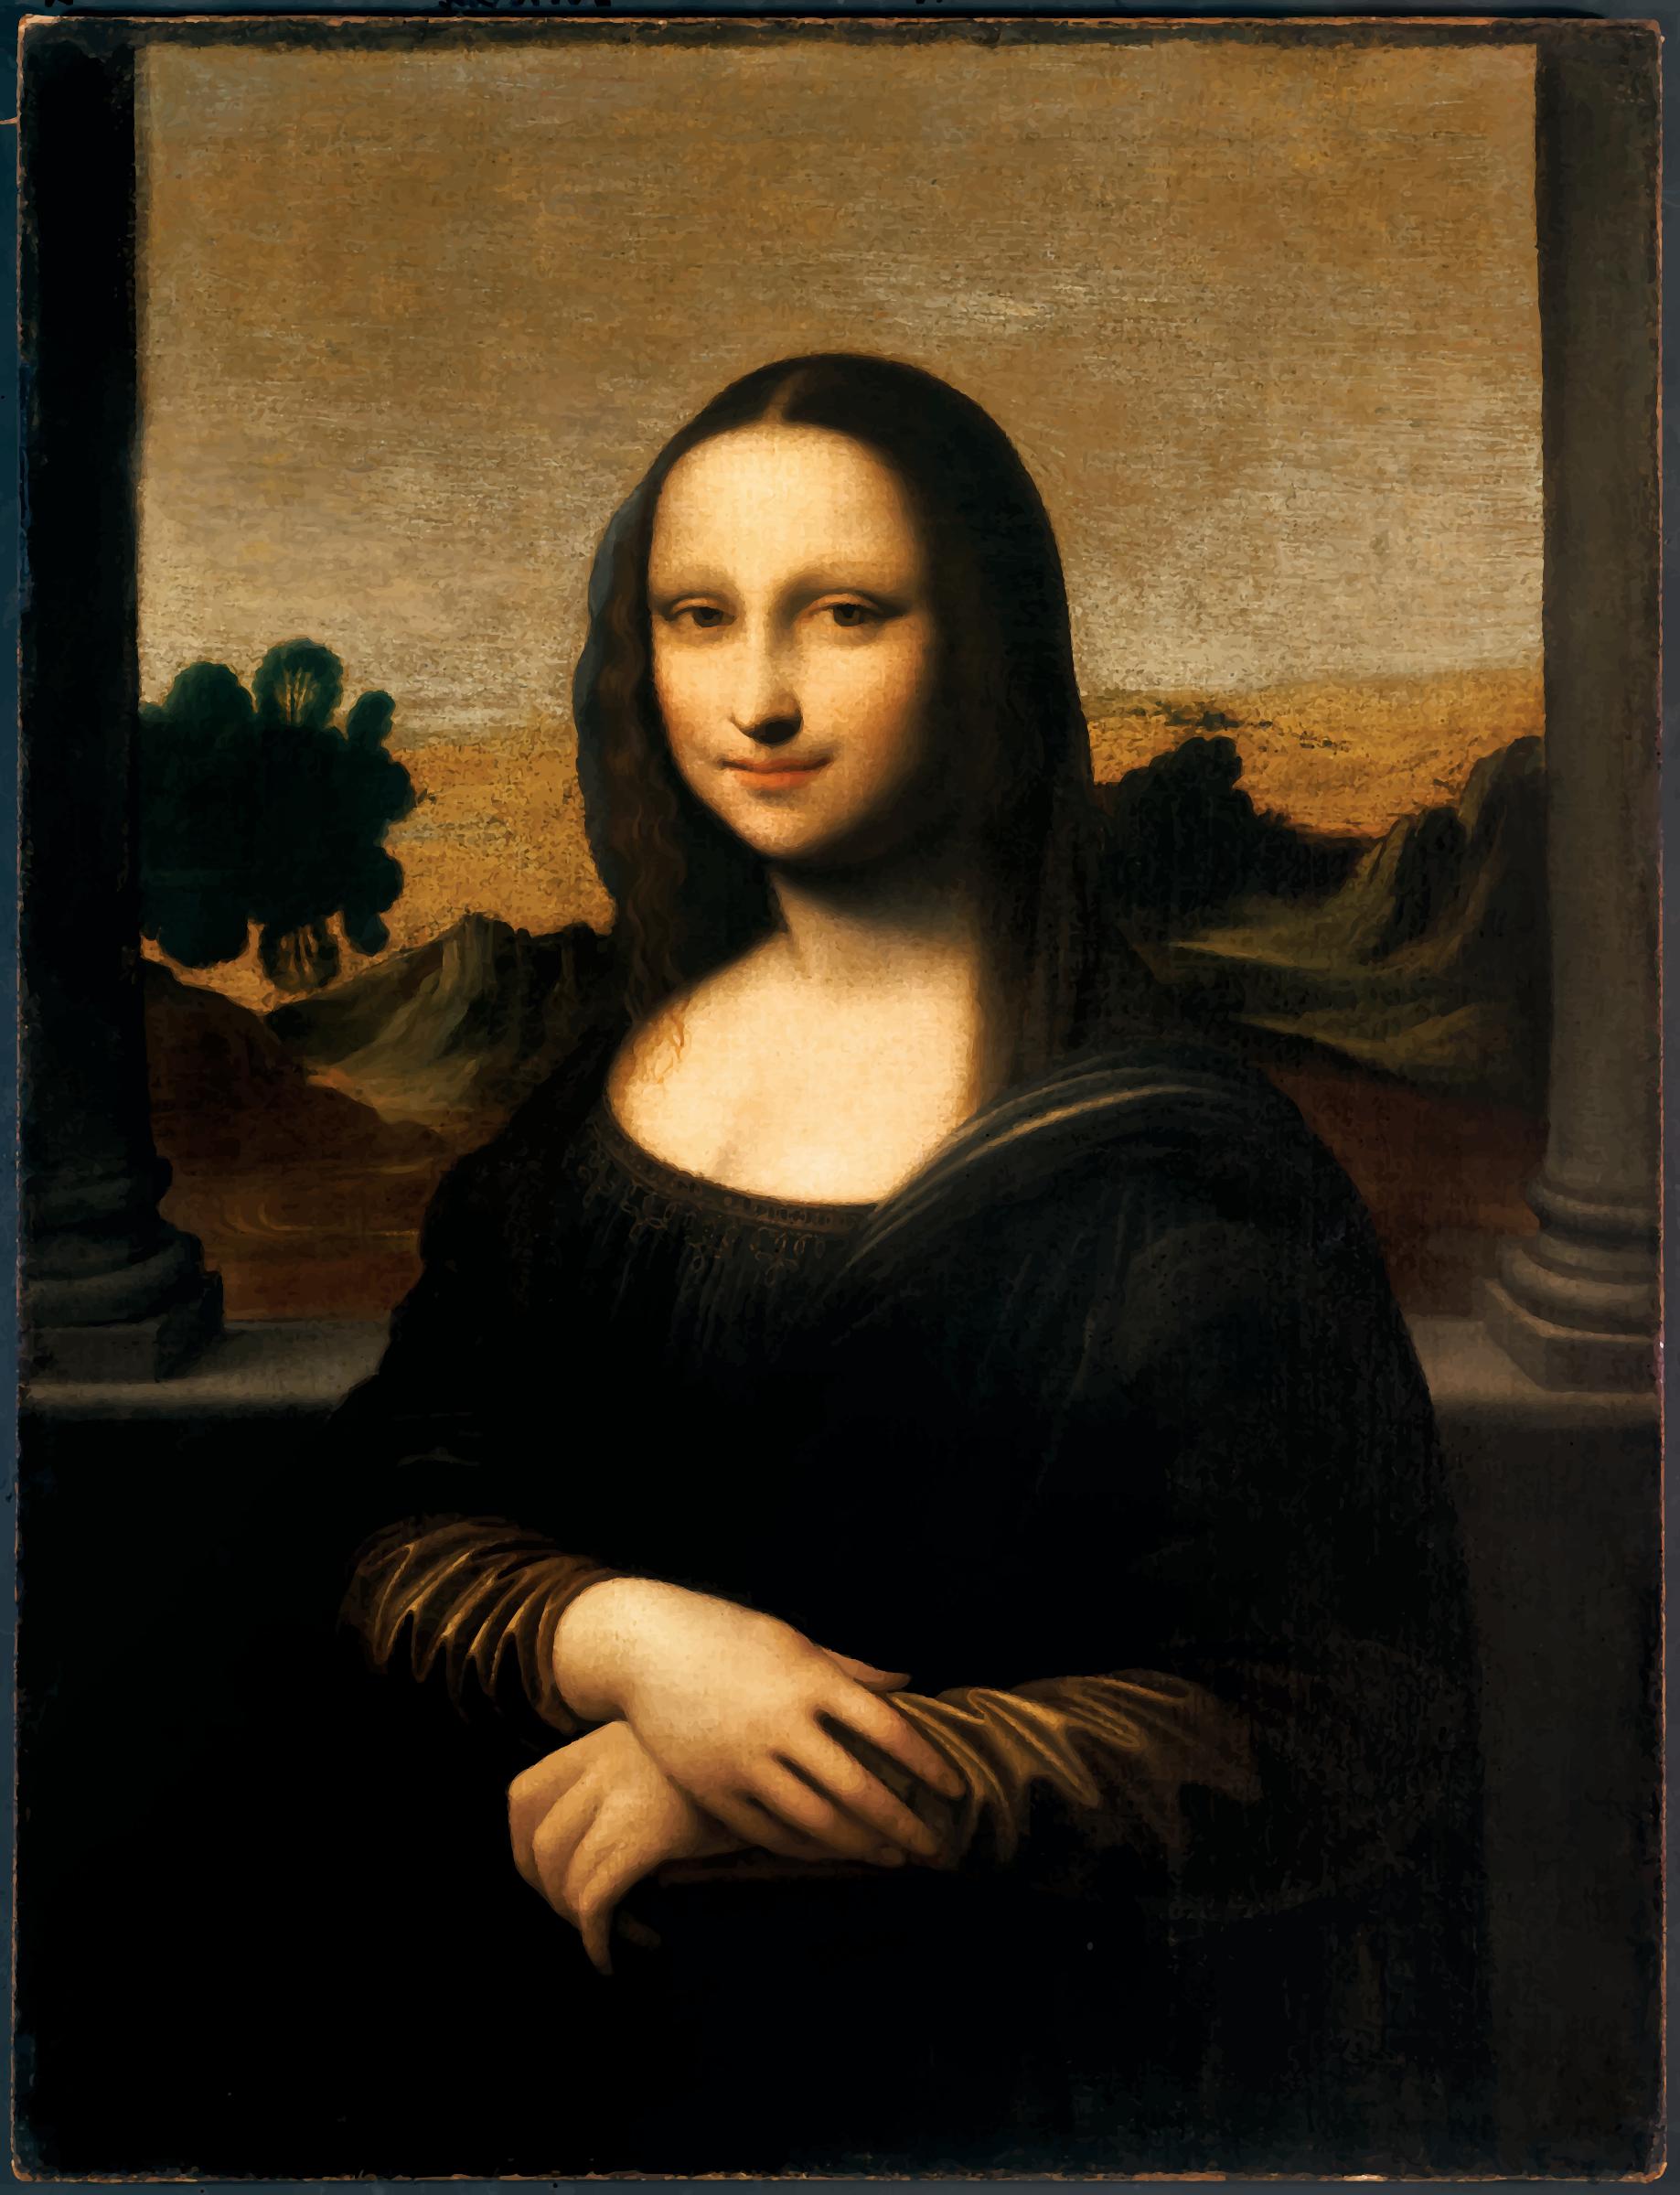 Renaissance clipart mona lisa #11